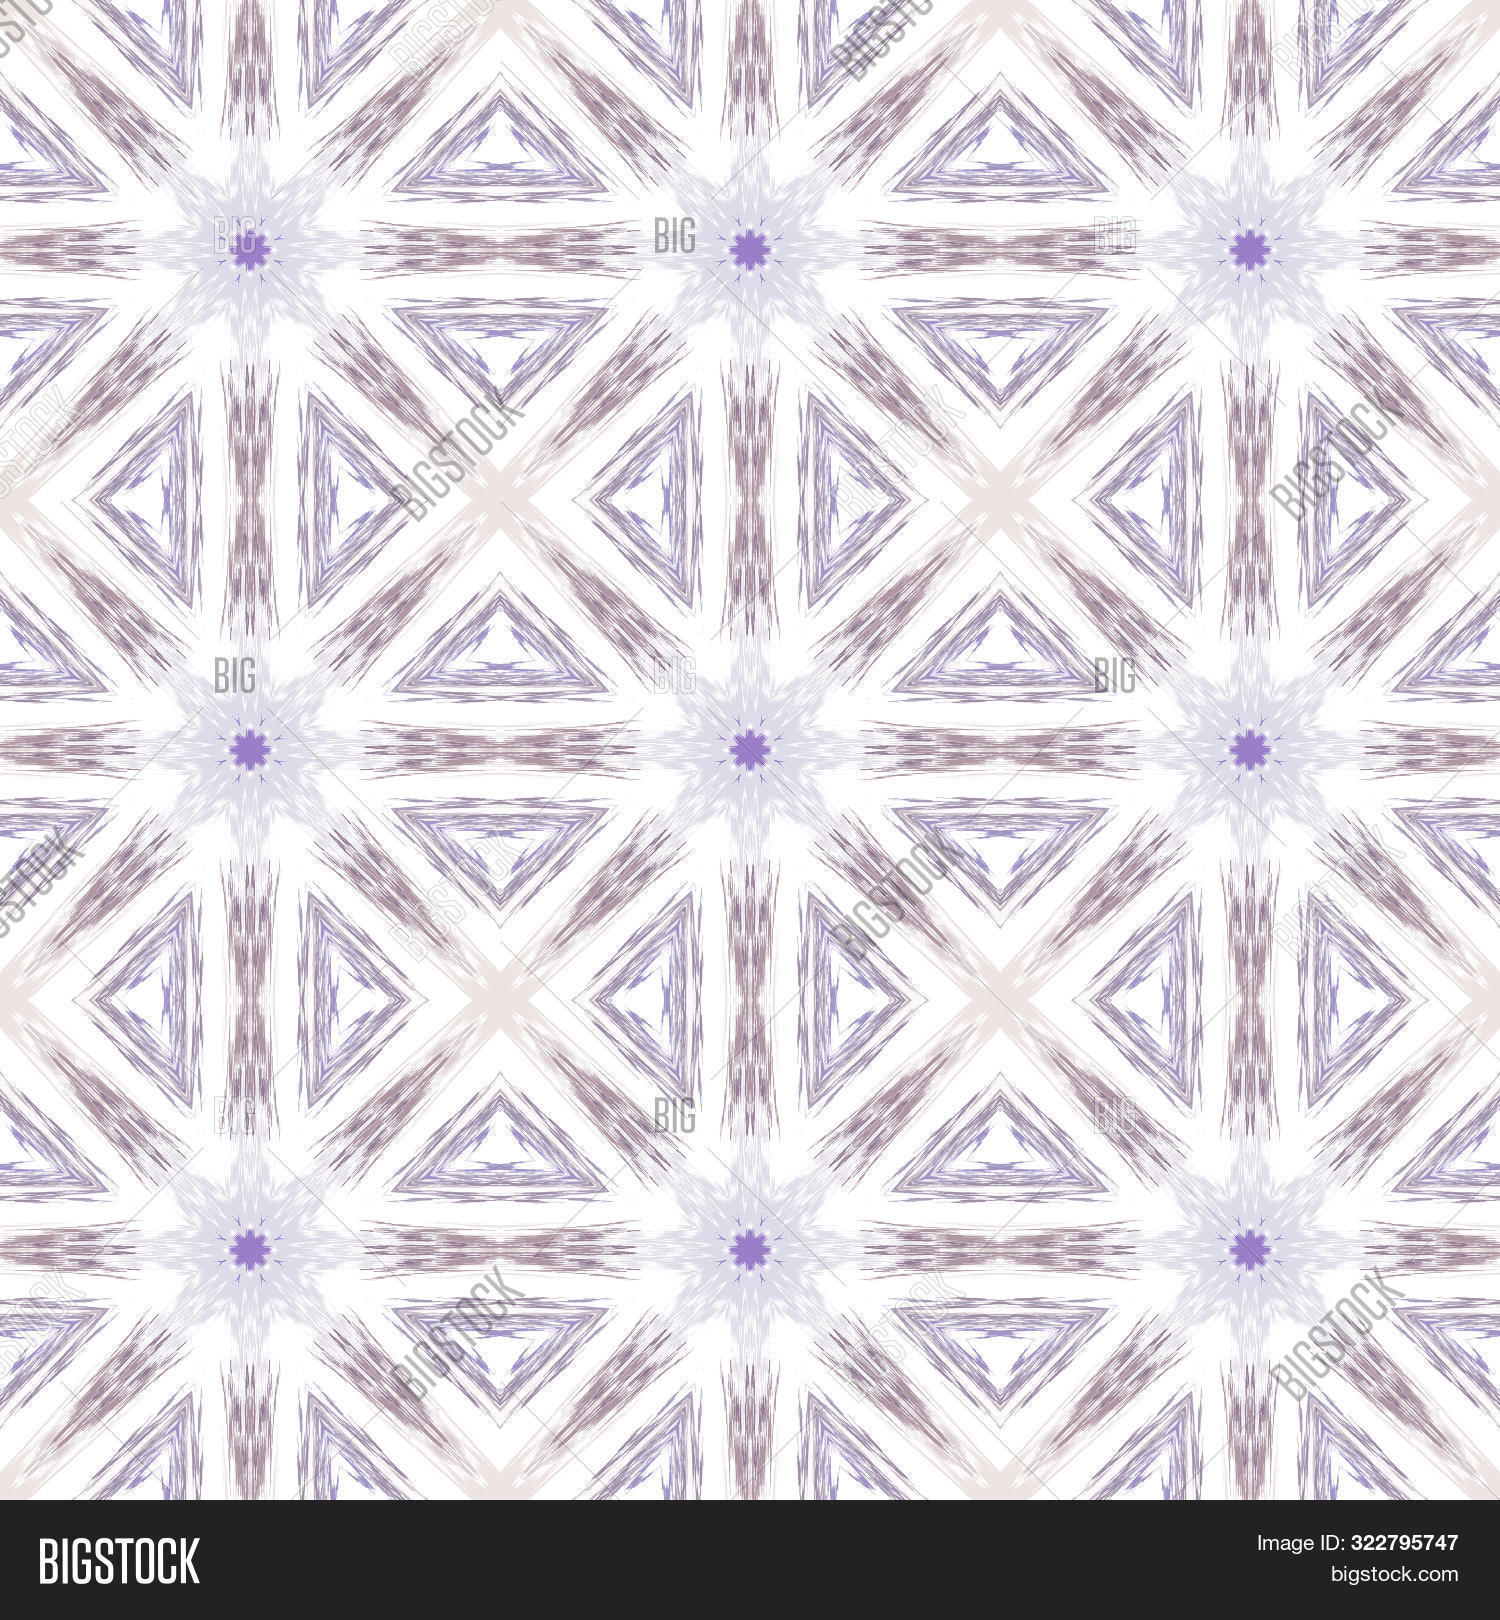 "2 pcs Lavender Flower Gingham Heart 4-1//2/"" Waterslide Ceramic Decals Bx"